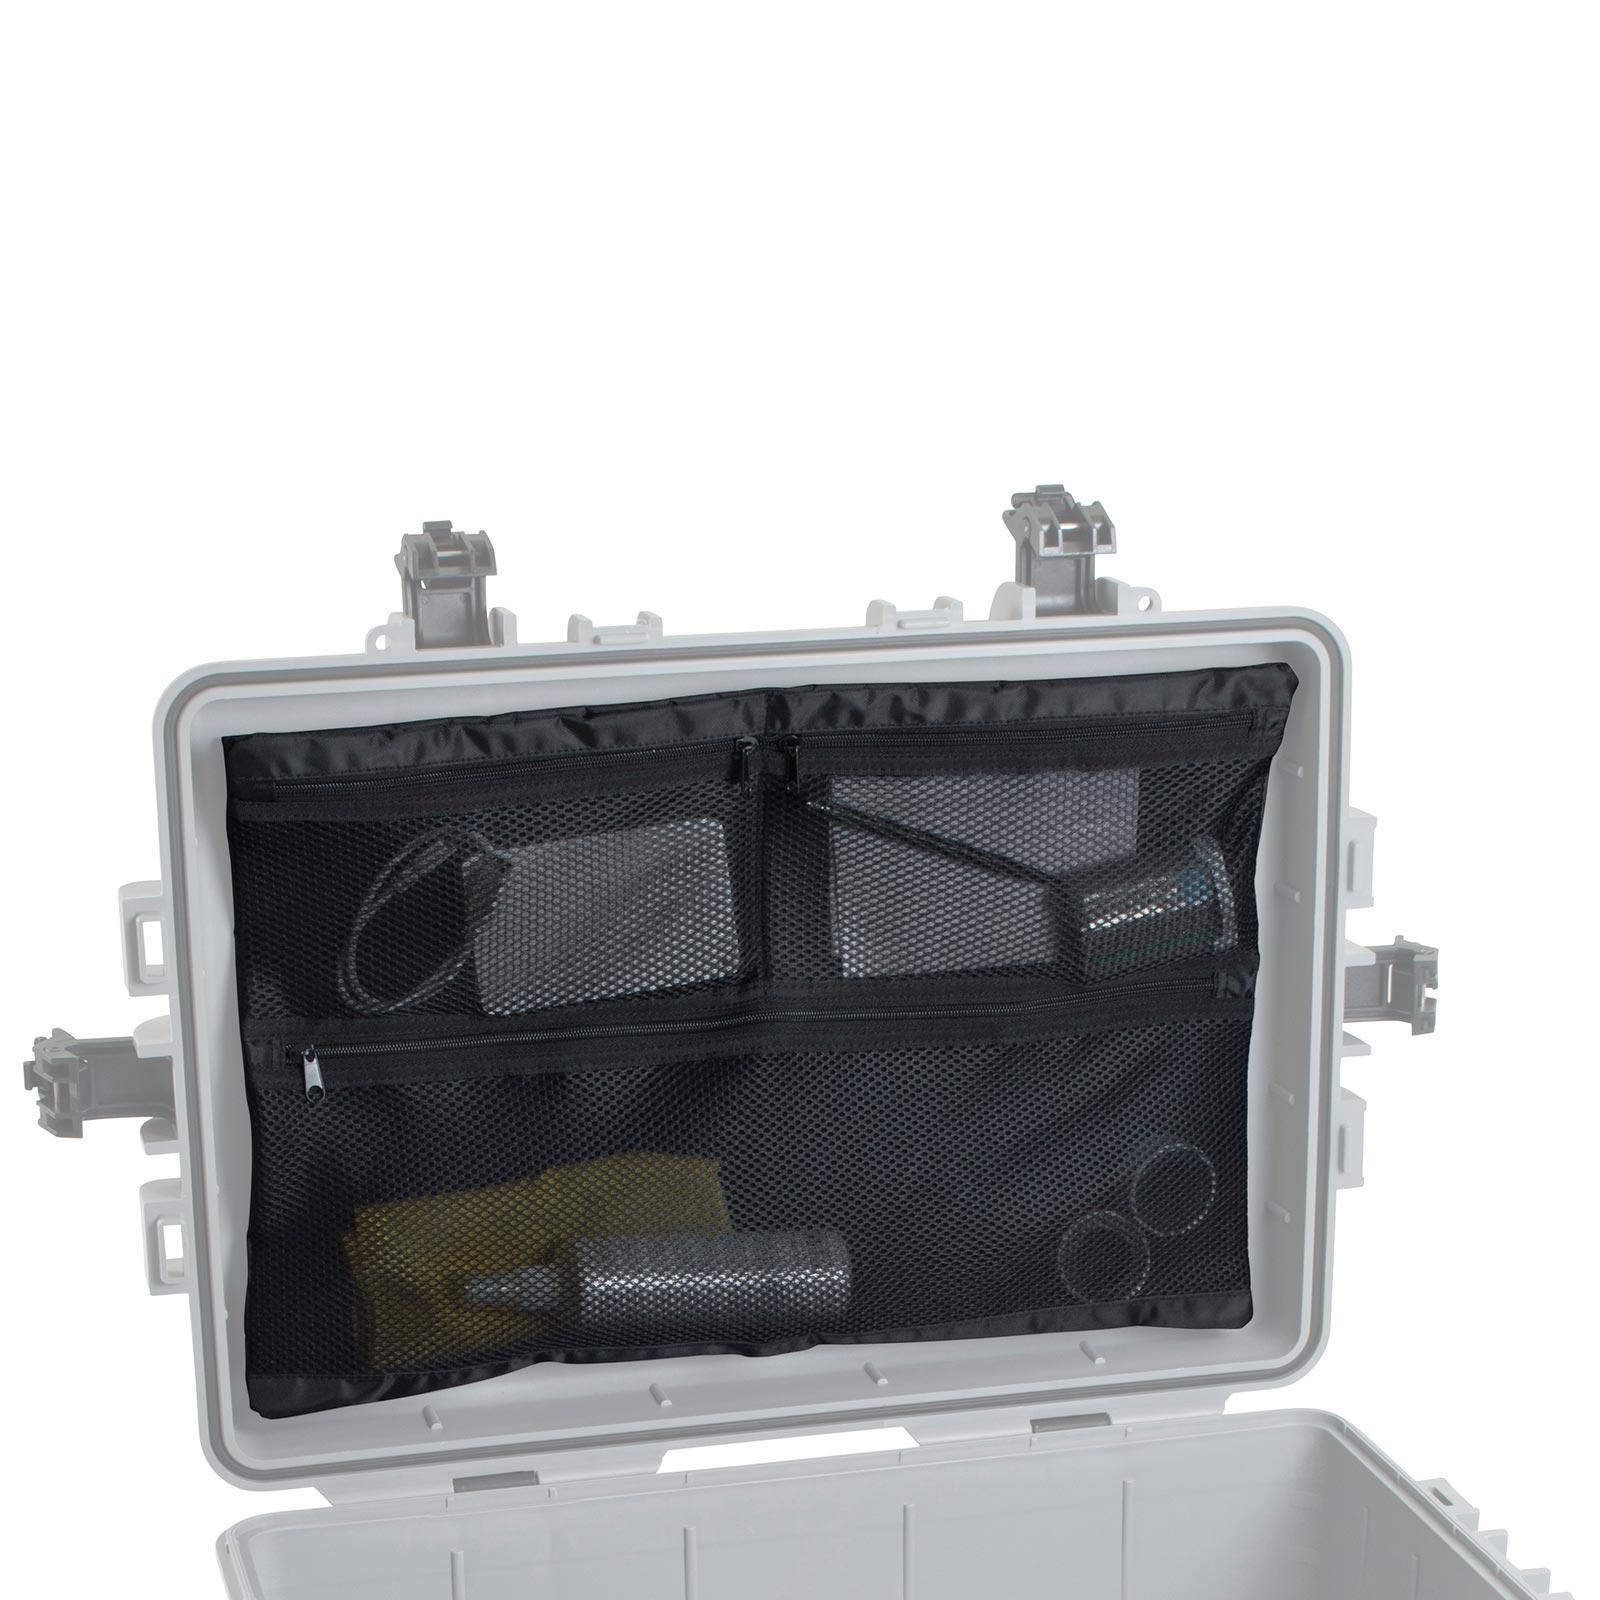 Gummiblende Okularabdeckung für Canon EOS 200D 300D 350D 450D 500D EF Eye Cup